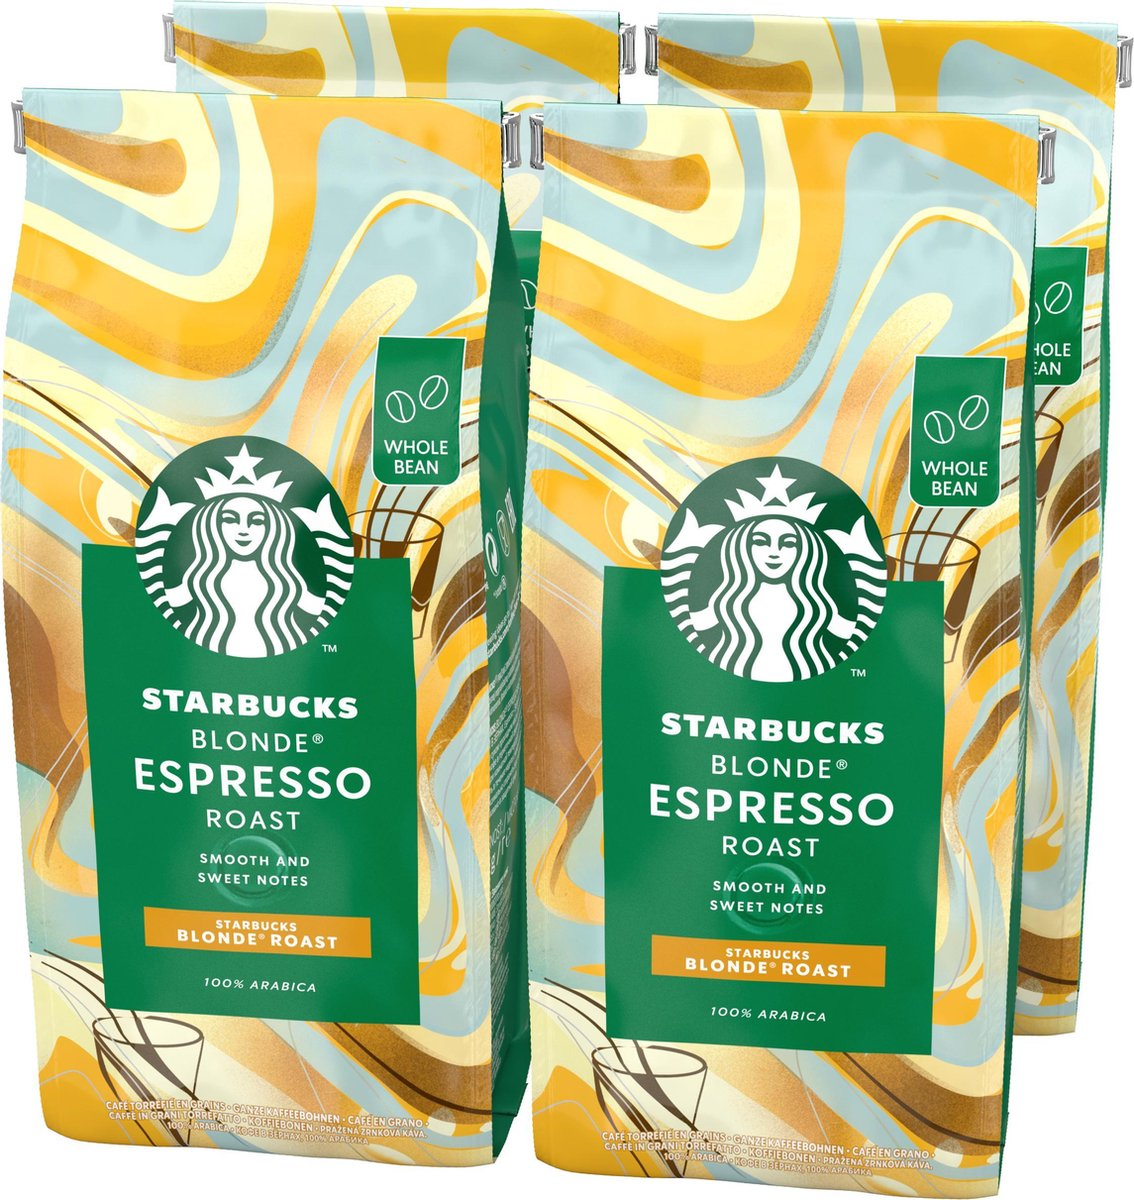 Starbucks Blonde Espresso Roast koffie - koffiebonen - 4 zakken à 450 gram